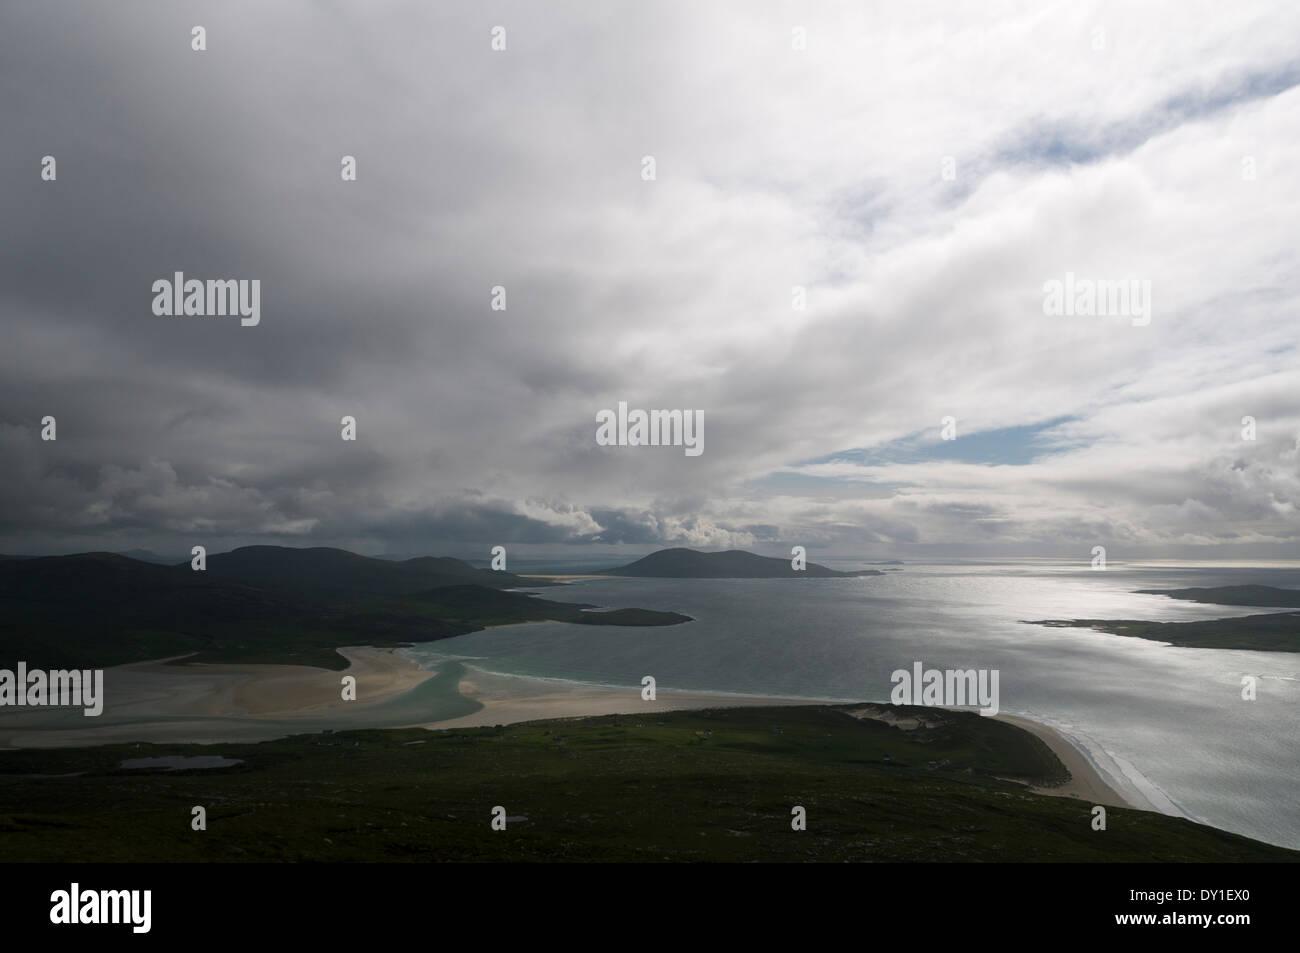 Tràigh Sheileboist beach and Ceapabhal (Toe Head - Gob an Tobha), from Beinn Dhubh, Harris, Western Isles, Scotland, UK - Stock Image